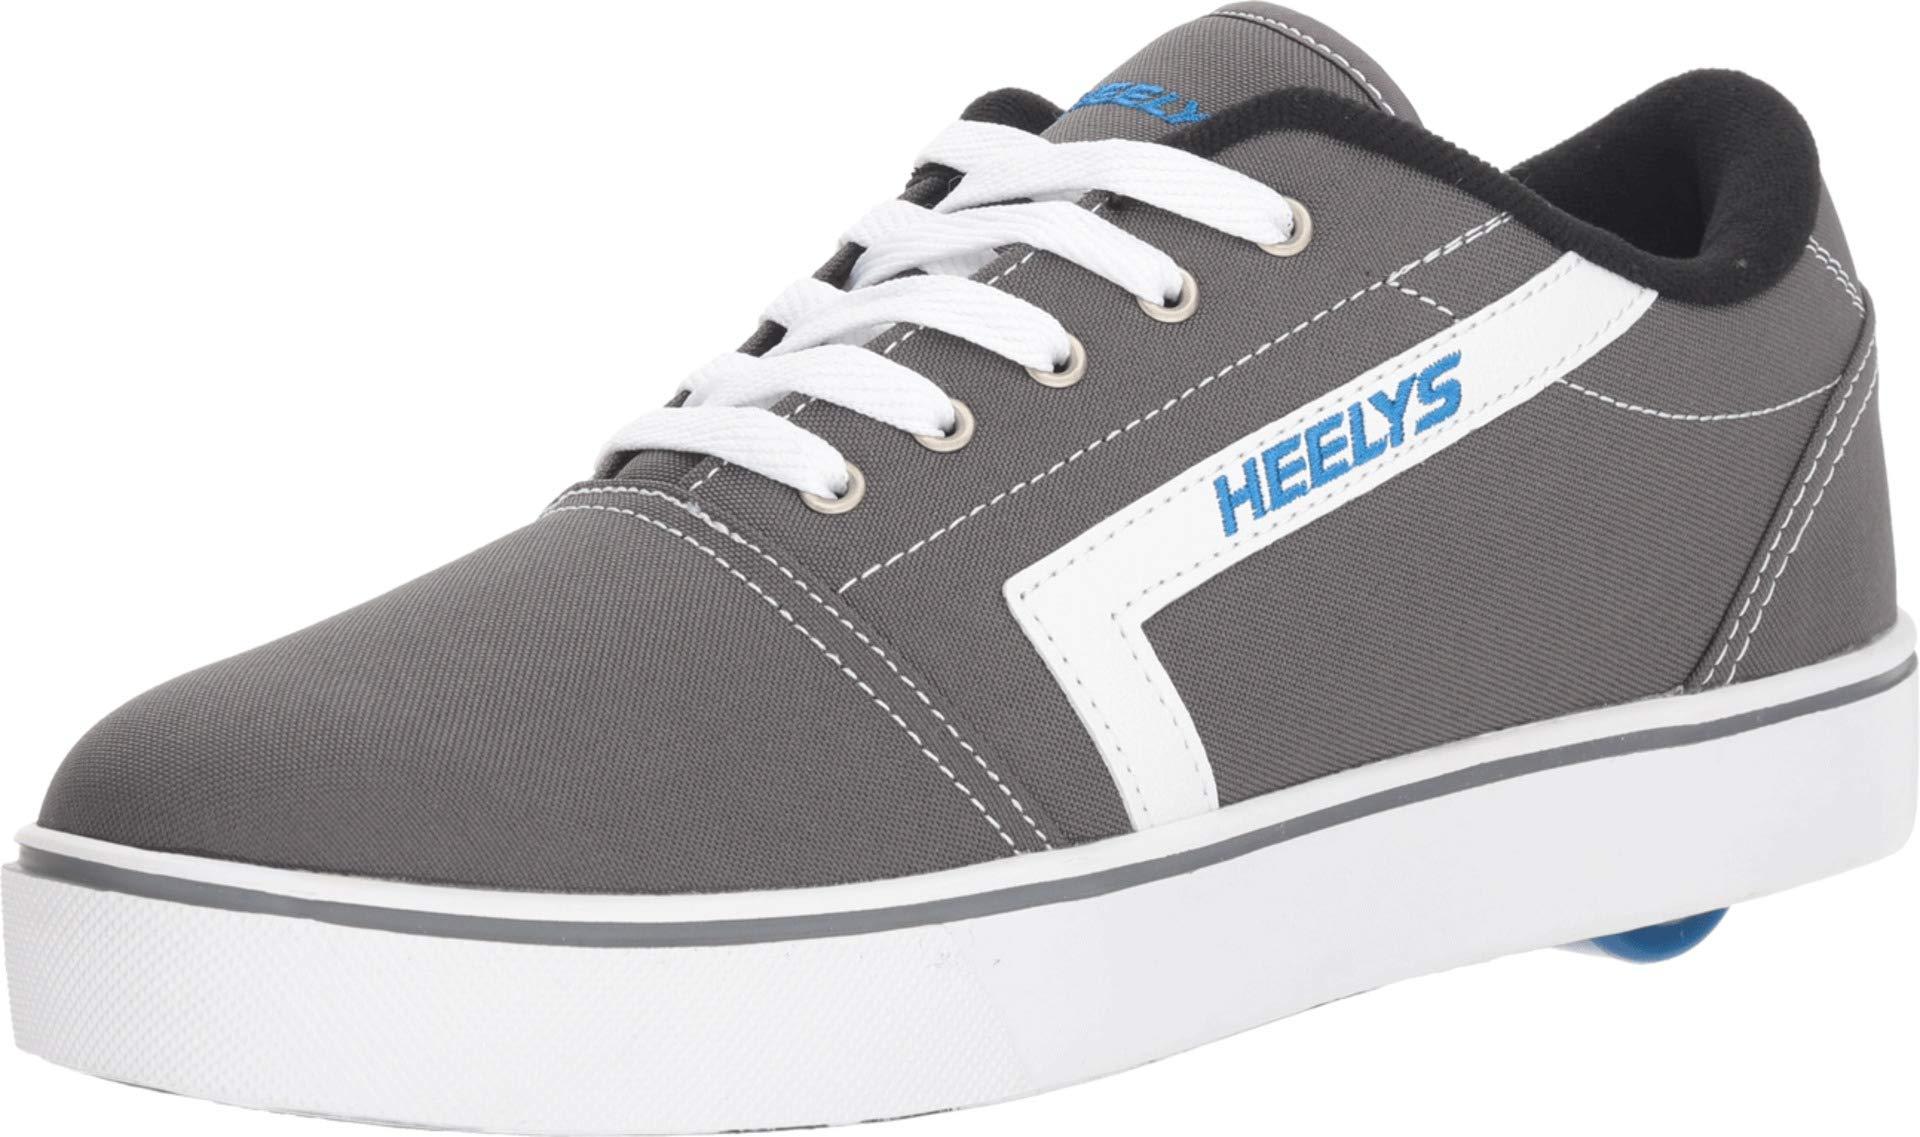 Heelys Men's GR8 Pro Grey/White/Royal 10 M US M by Heelys